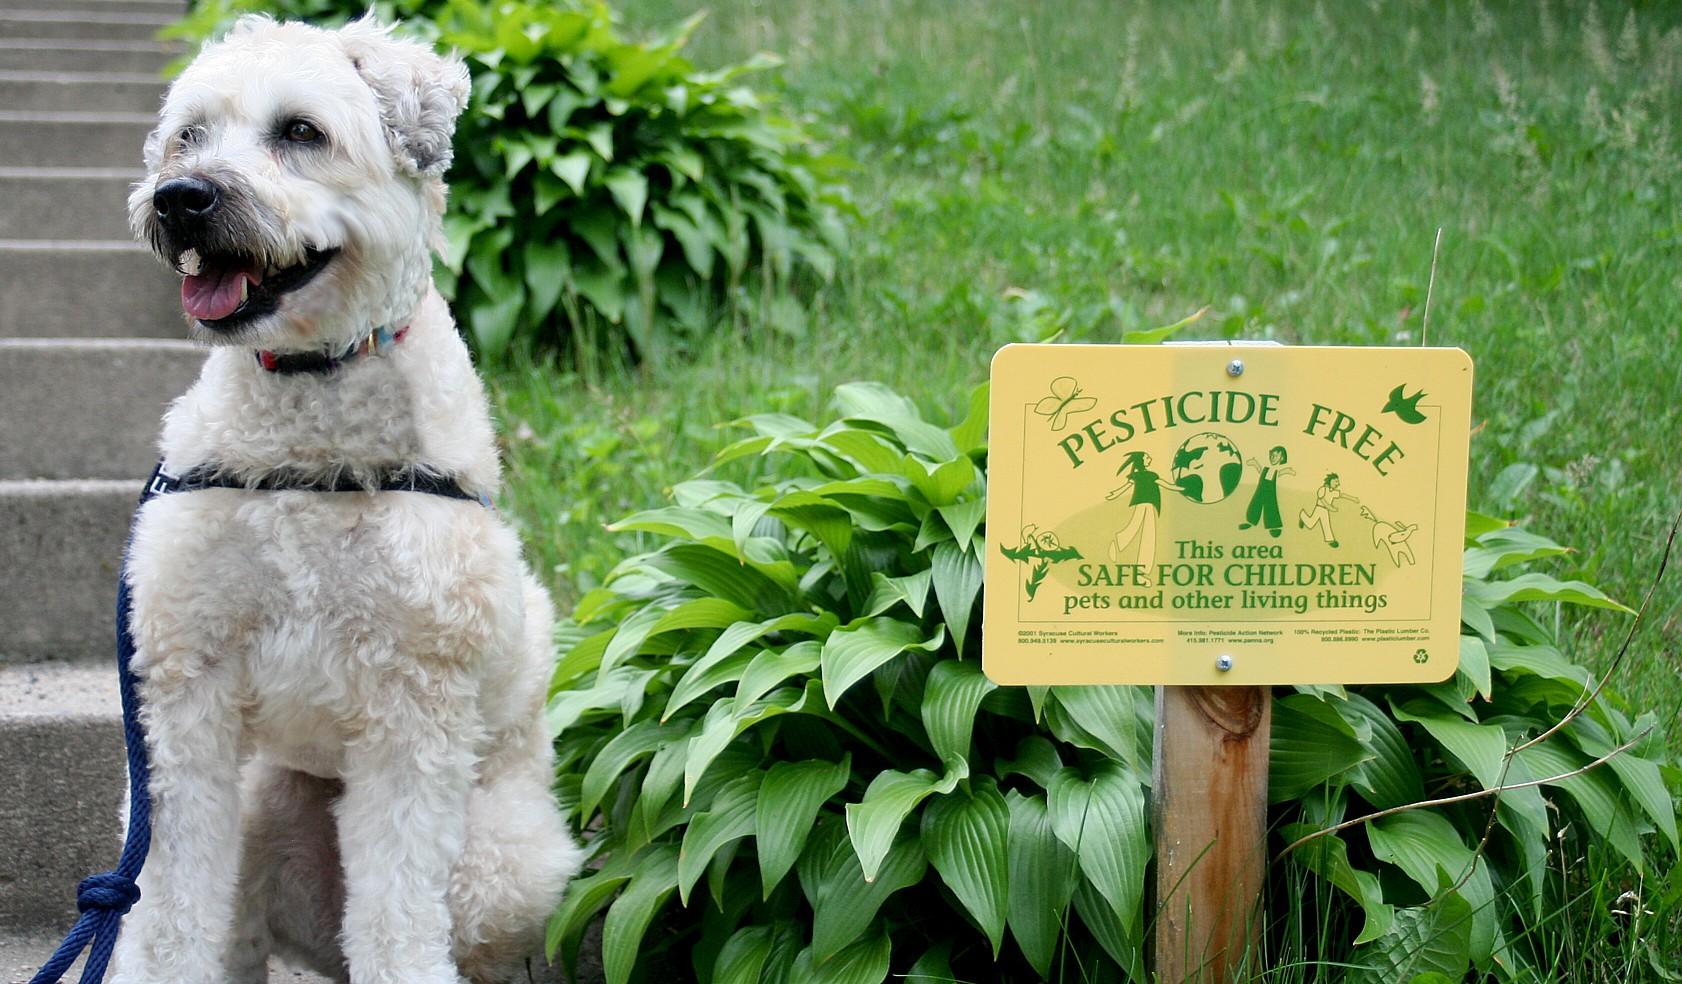 Pesticide_free_yard